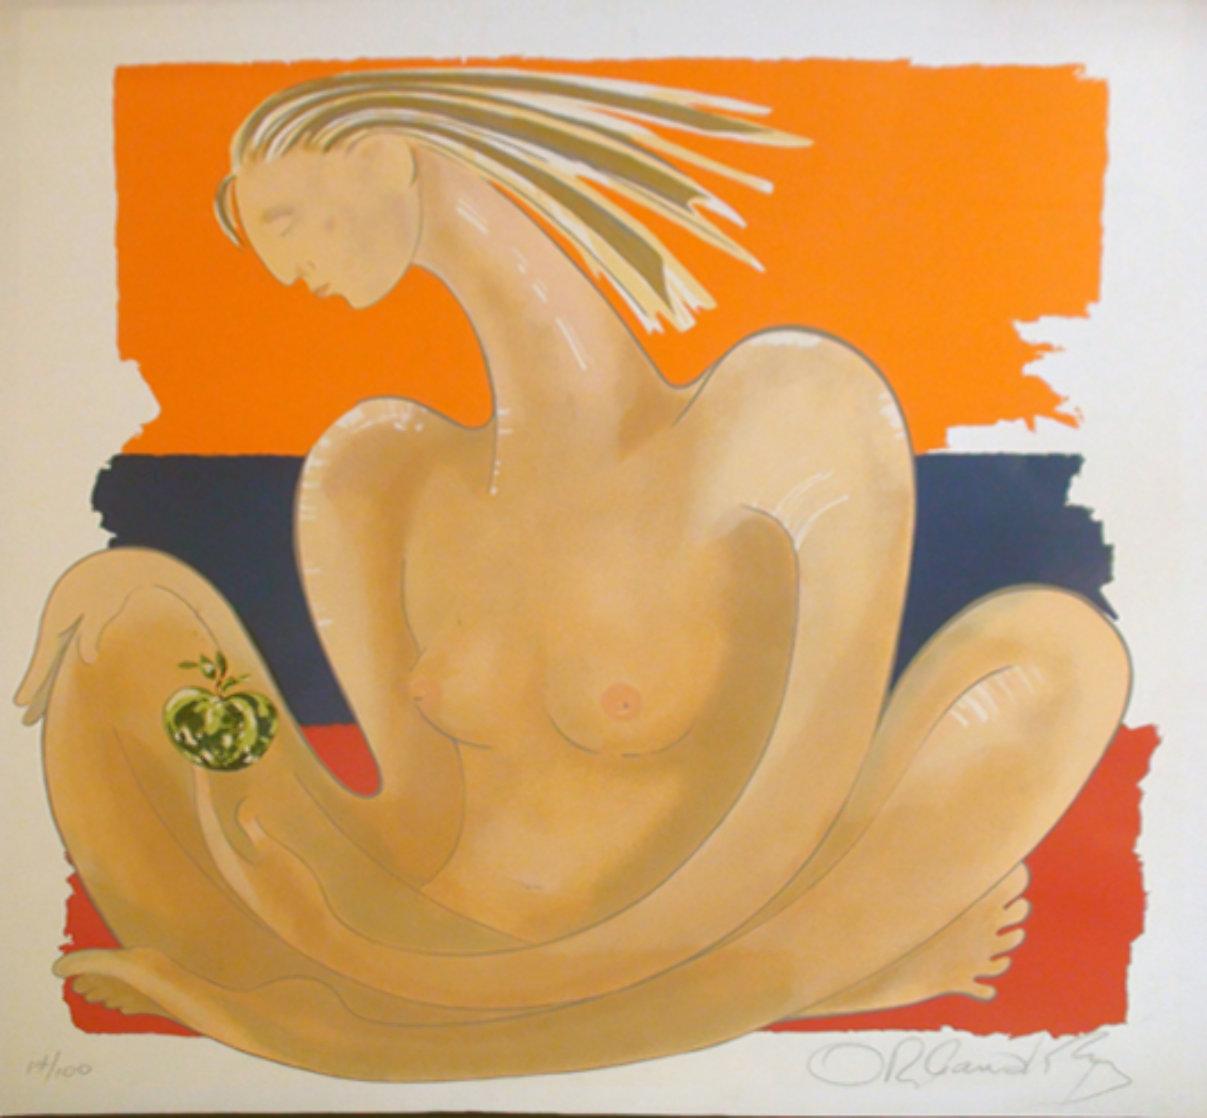 Herencia 1984 Limited Edition Print by Agudelo-Botero Orlando (Orlando A.B.)